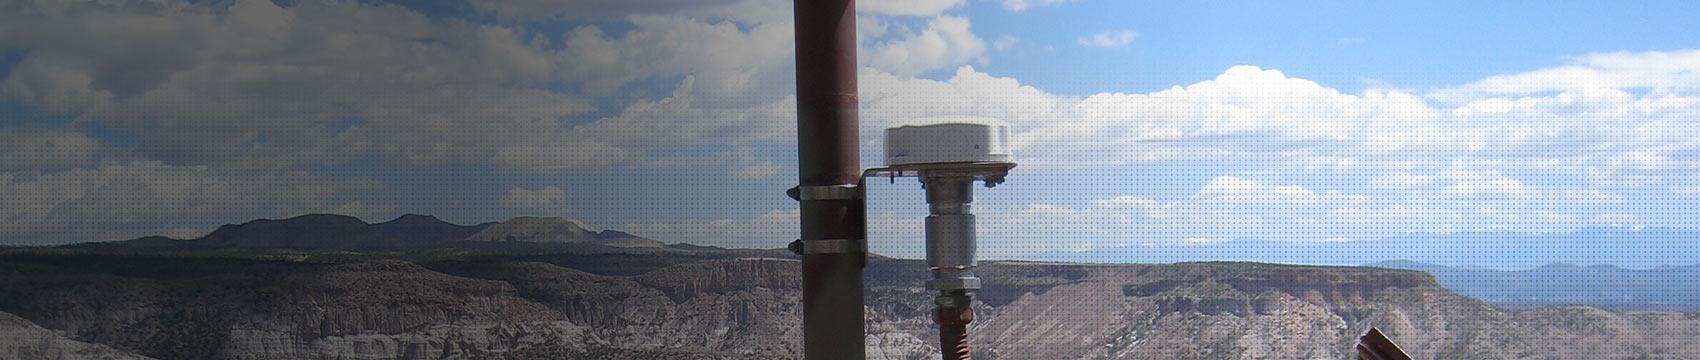 satellite tracking device